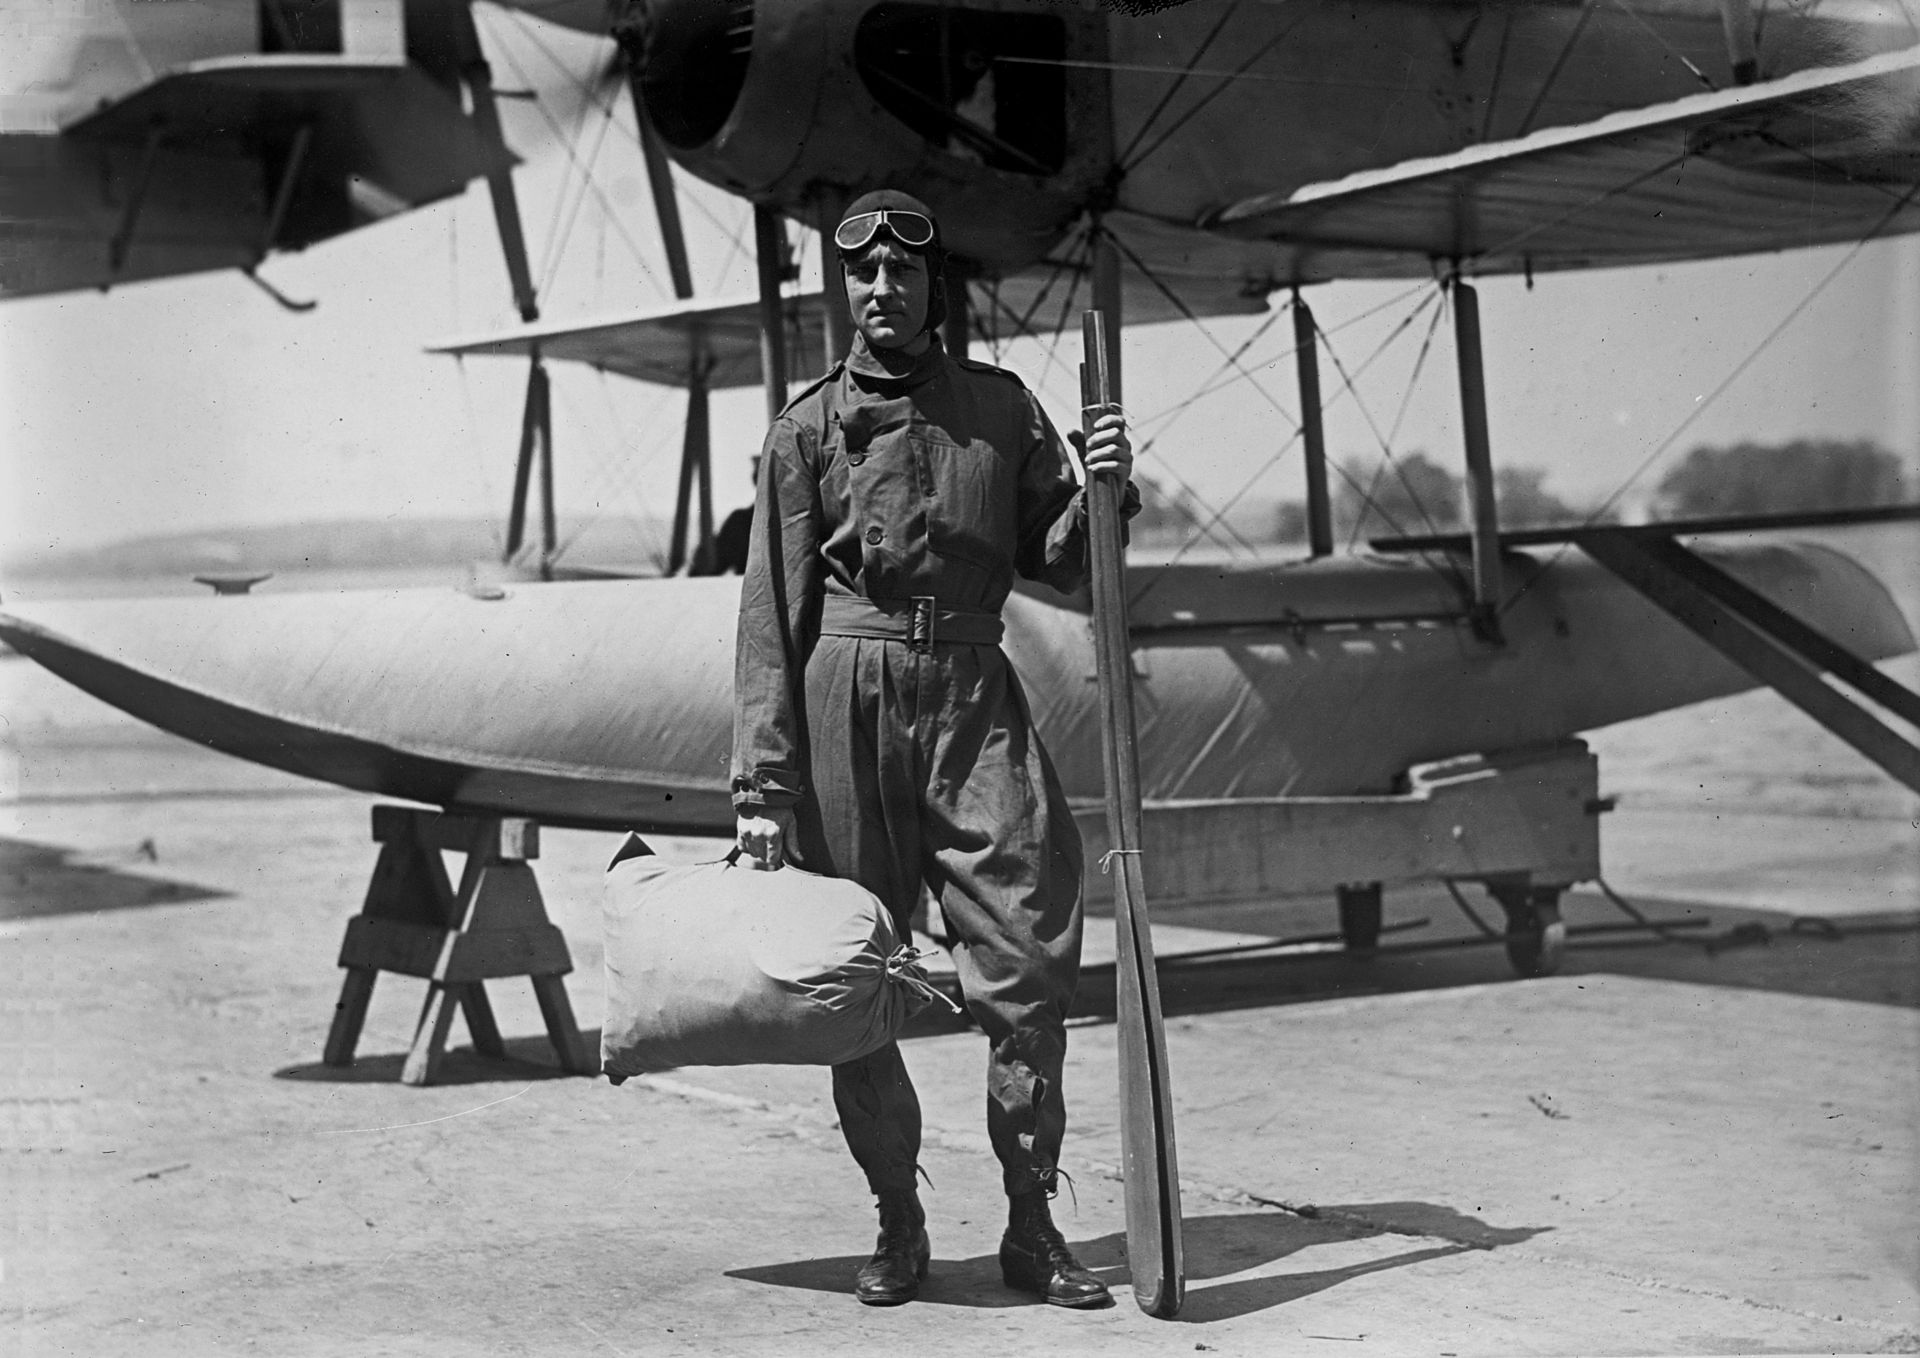 Lt. Com. Byrd and aircraft